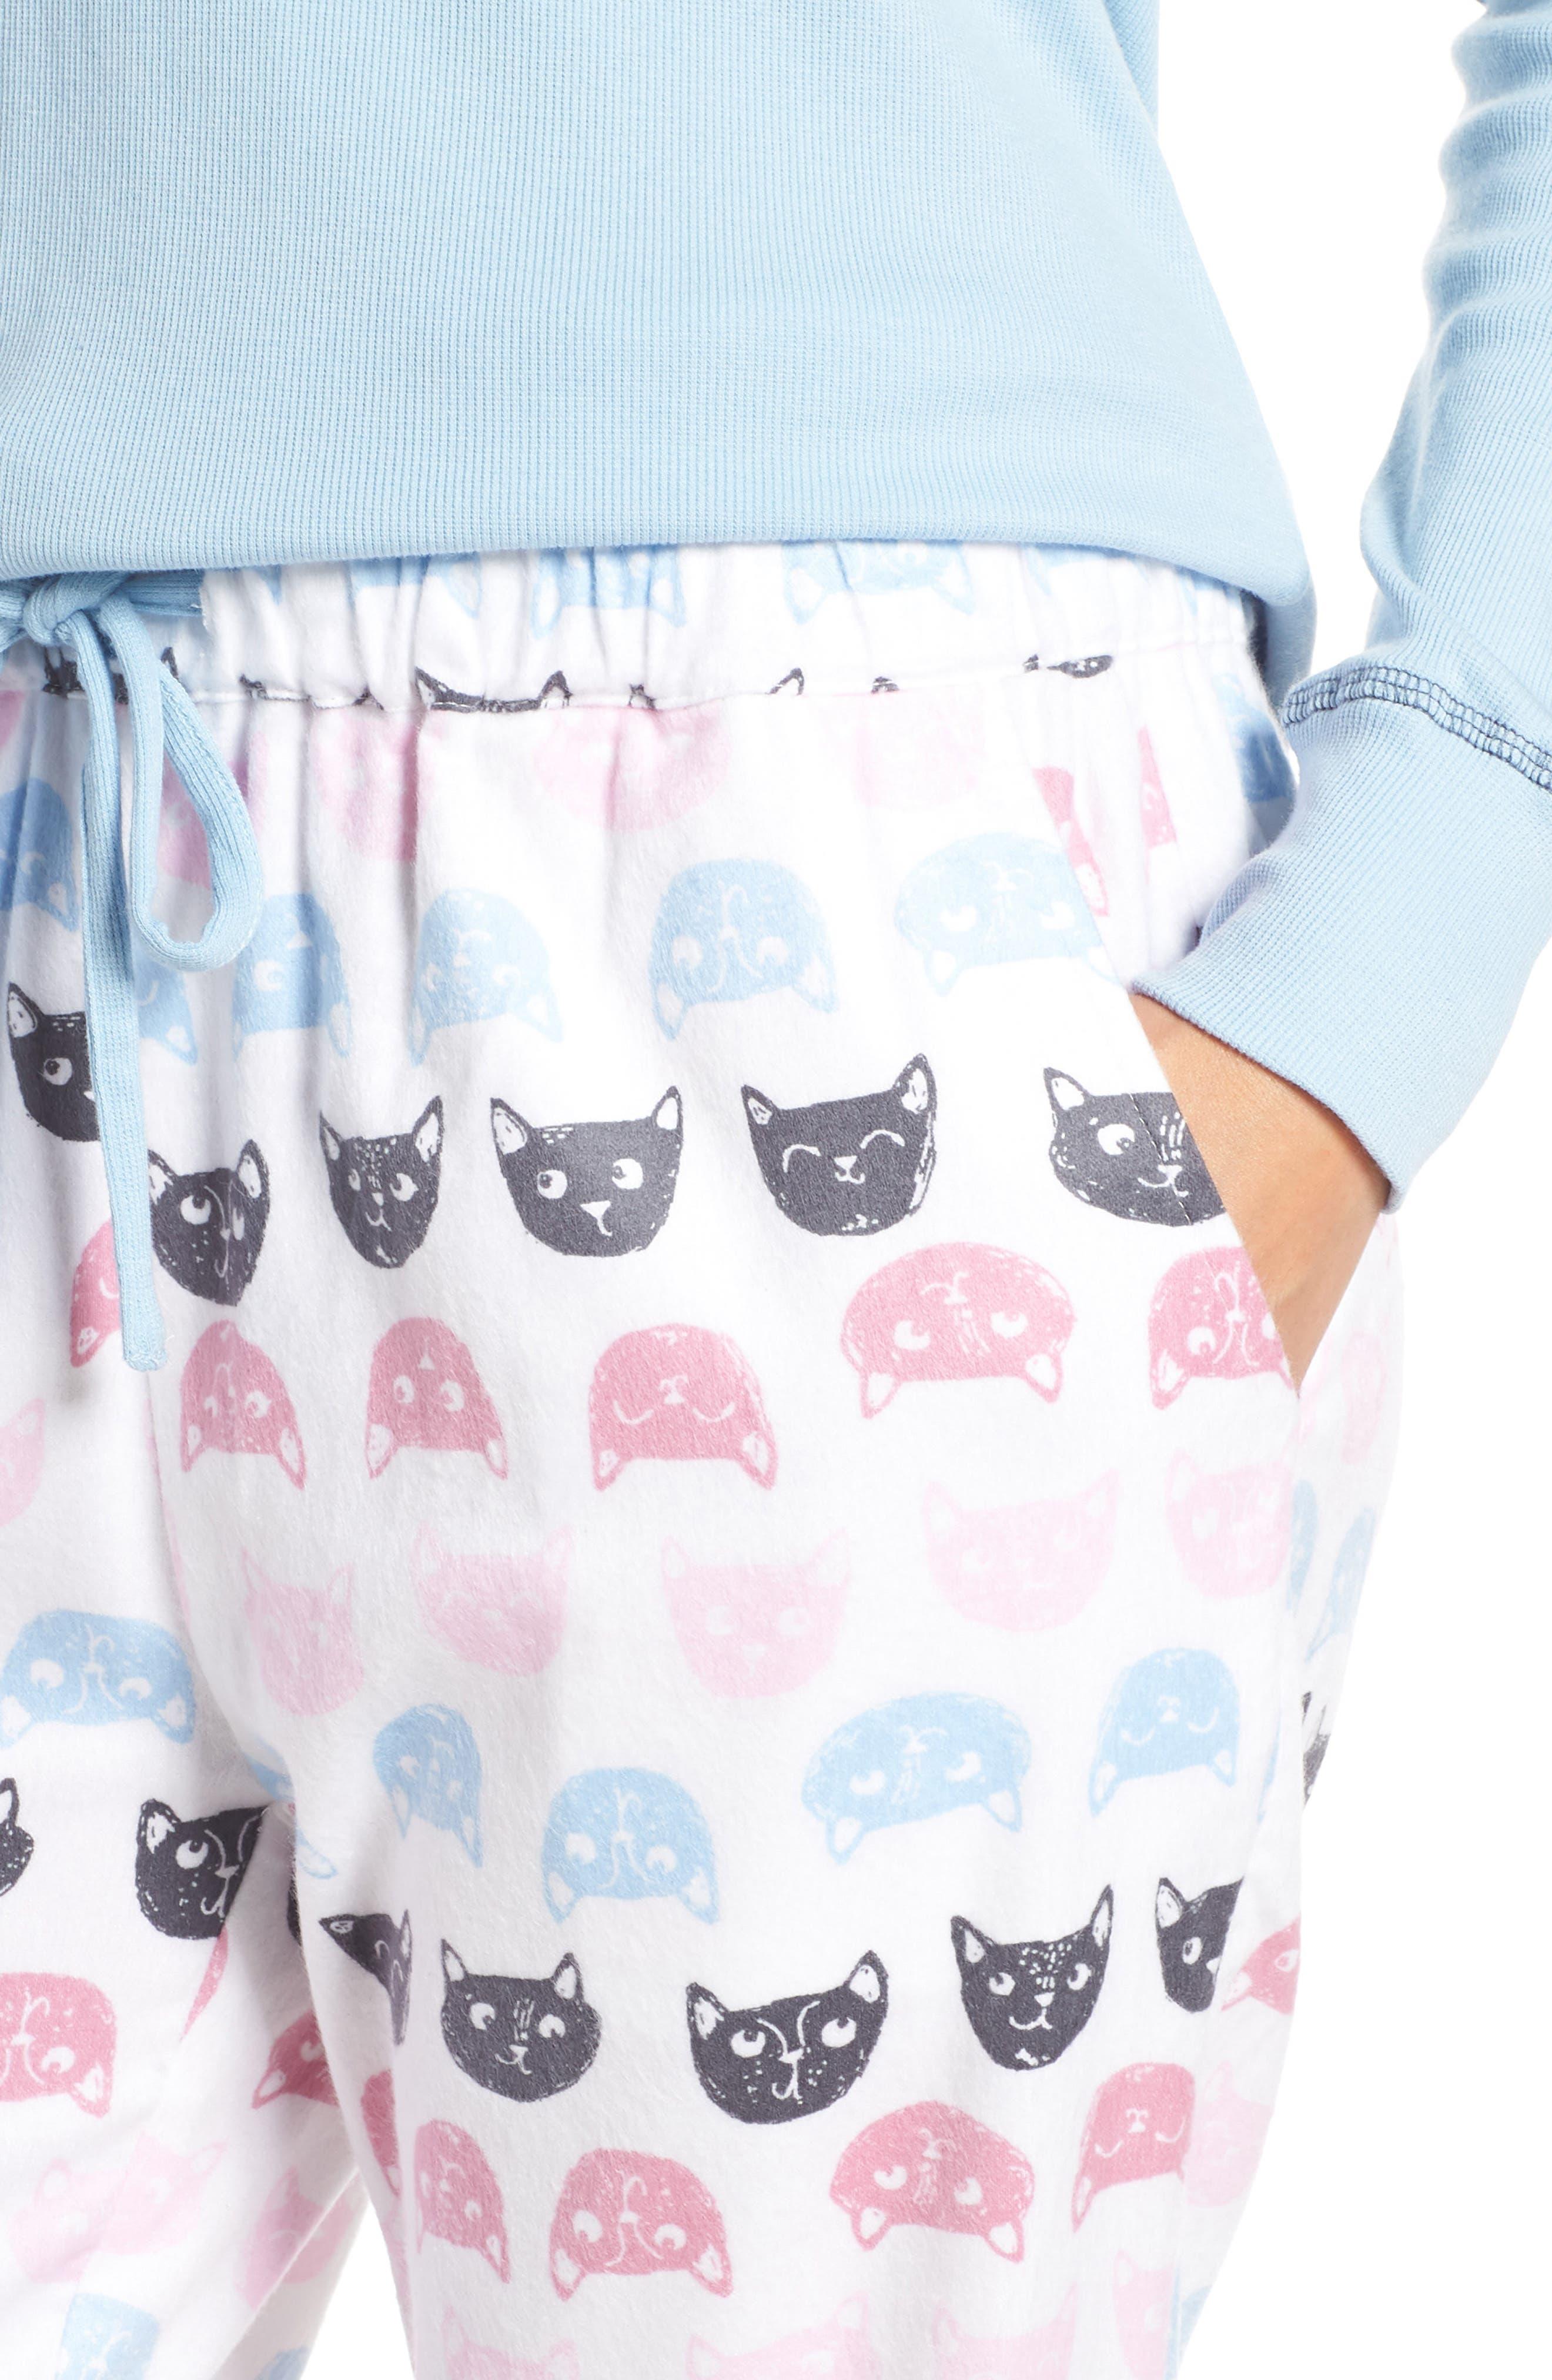 MUNKI MUNKI,                             Knit & Flannel Pajamas,                             Alternate thumbnail 4, color,                             WHITE CATS